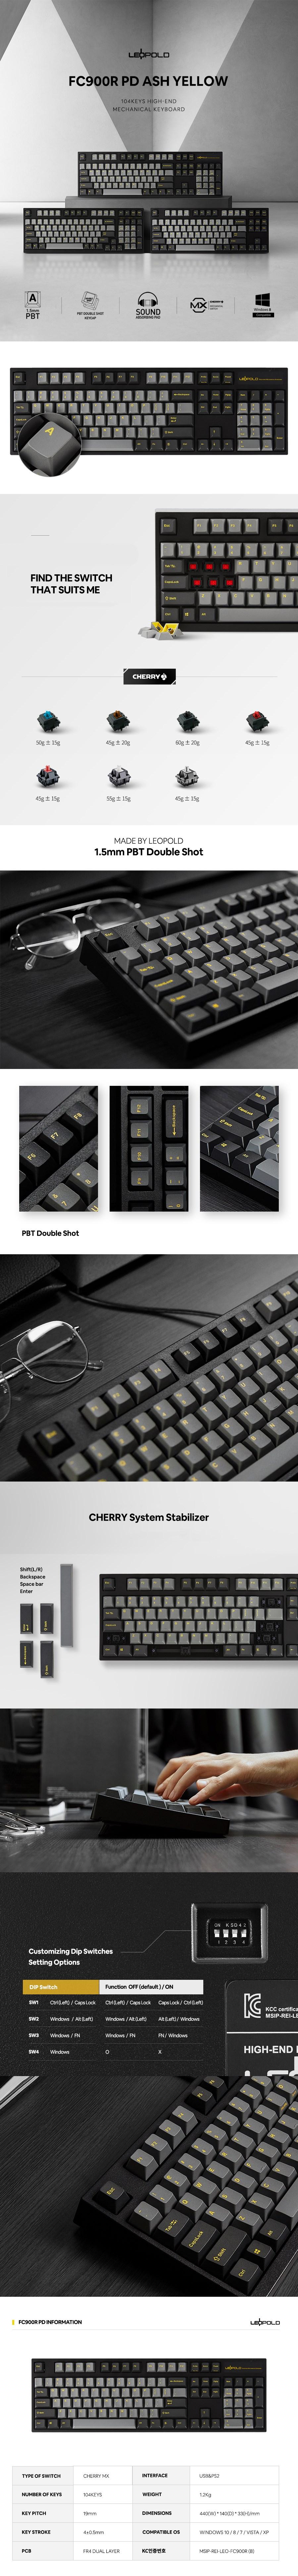 Leopold FC900R Ash YF Mechanical Keyboard - Overview 1